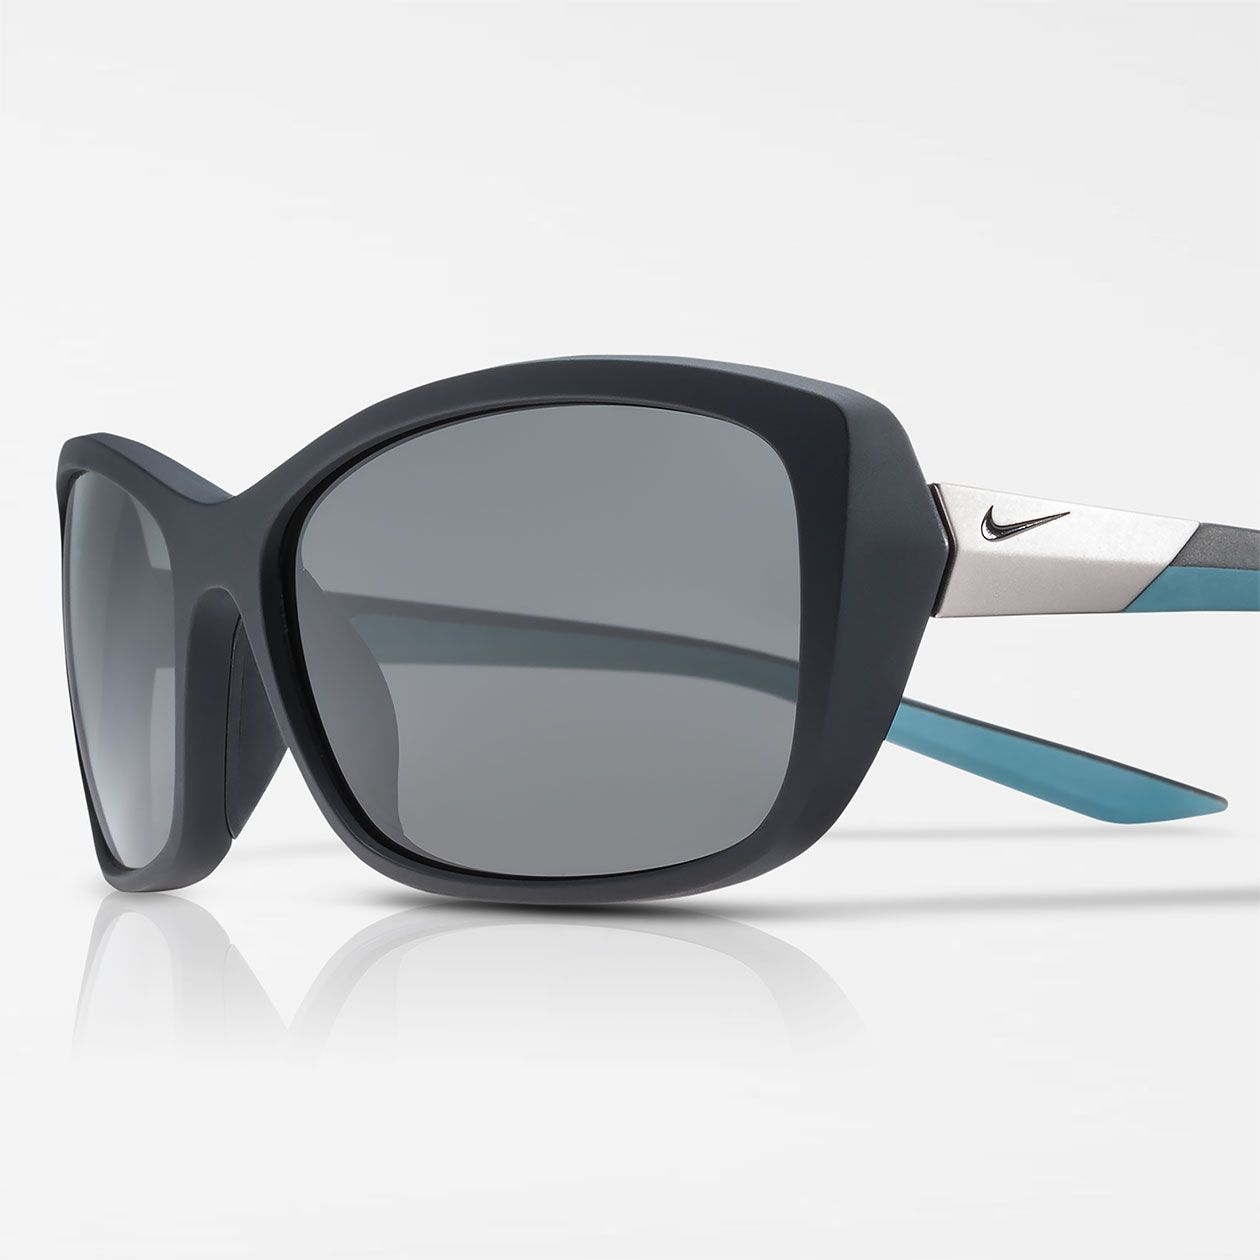 d0a5a7ceebf Nike Flex Finesse Multi-Sport Training Women sport sunglasses BLACK ...